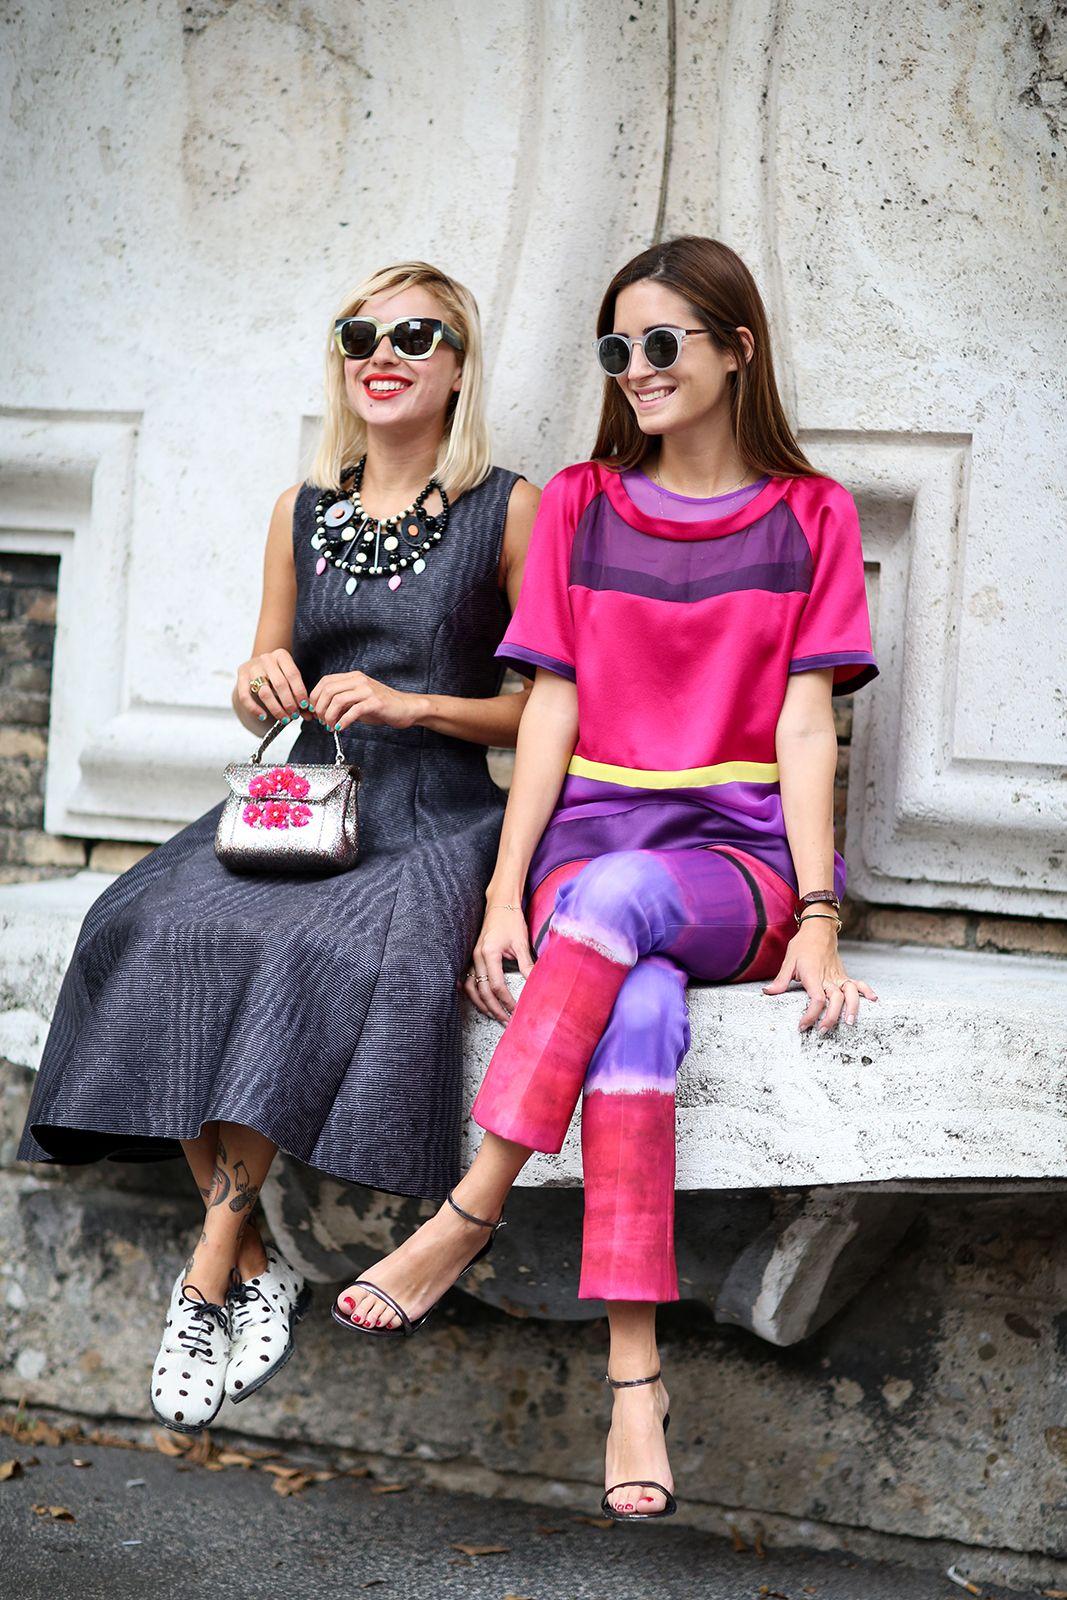 Italian teenage girl fashion 7